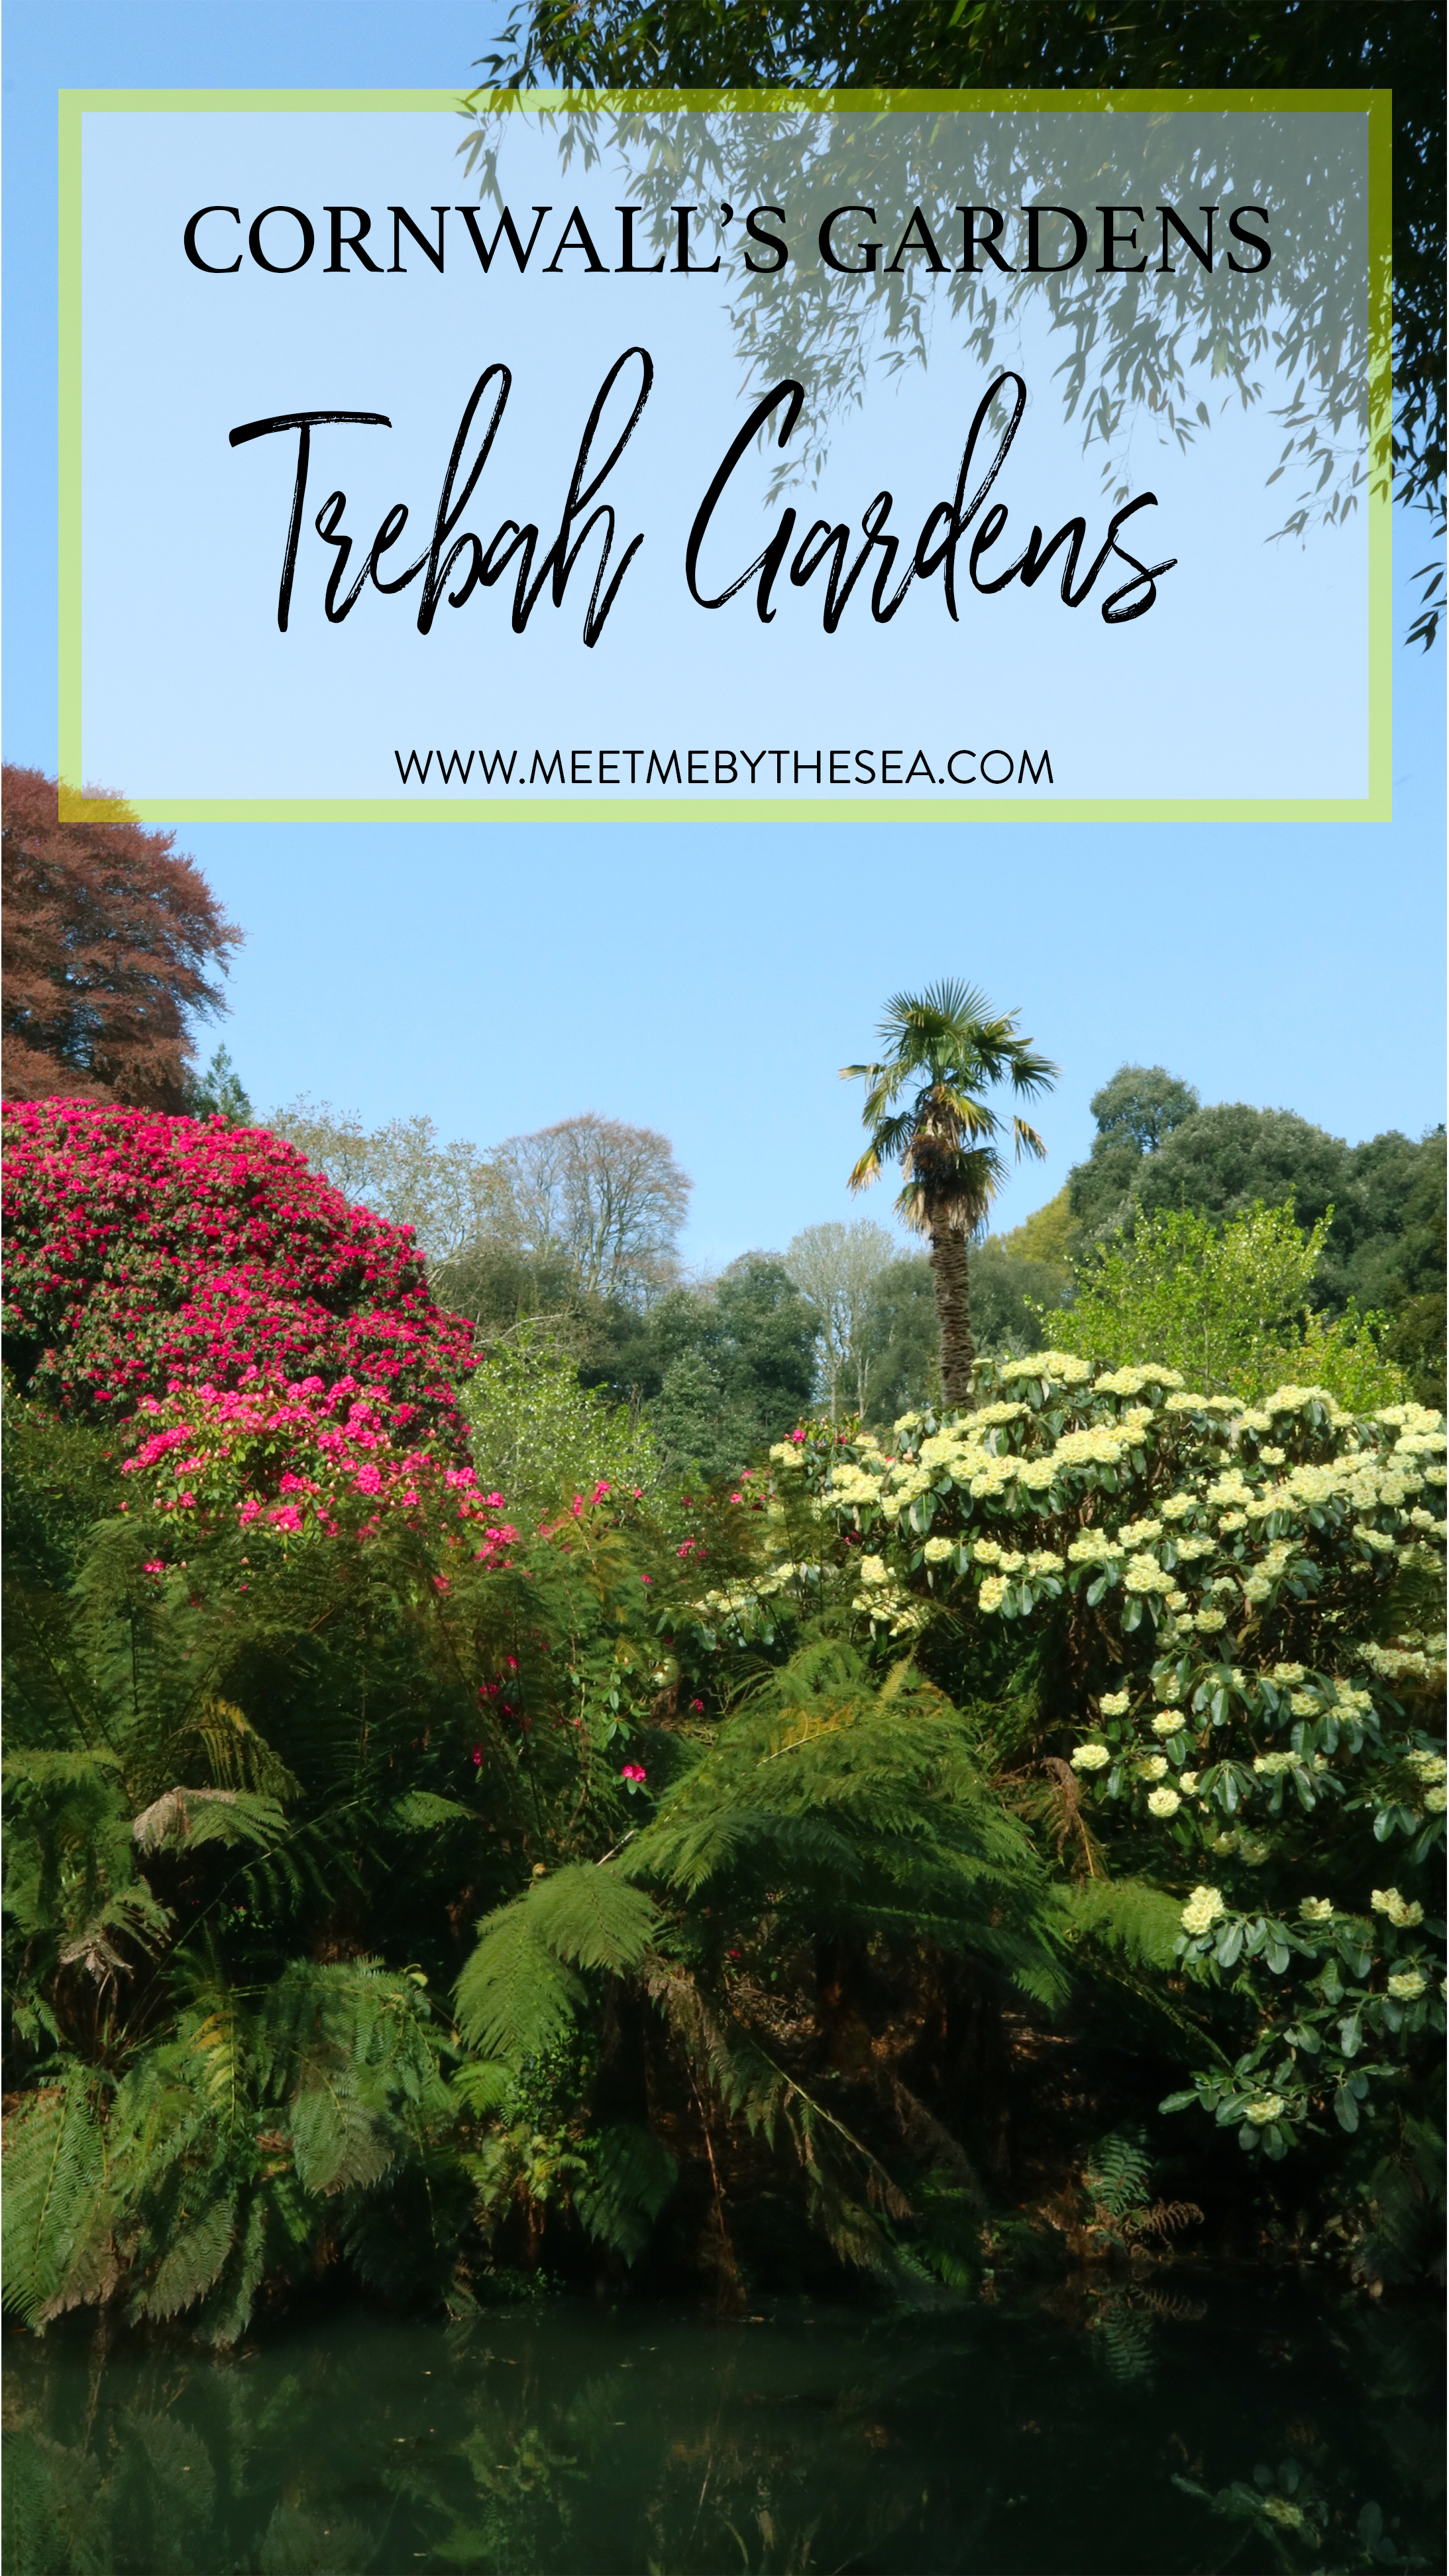 Trebah Gardens.jpg